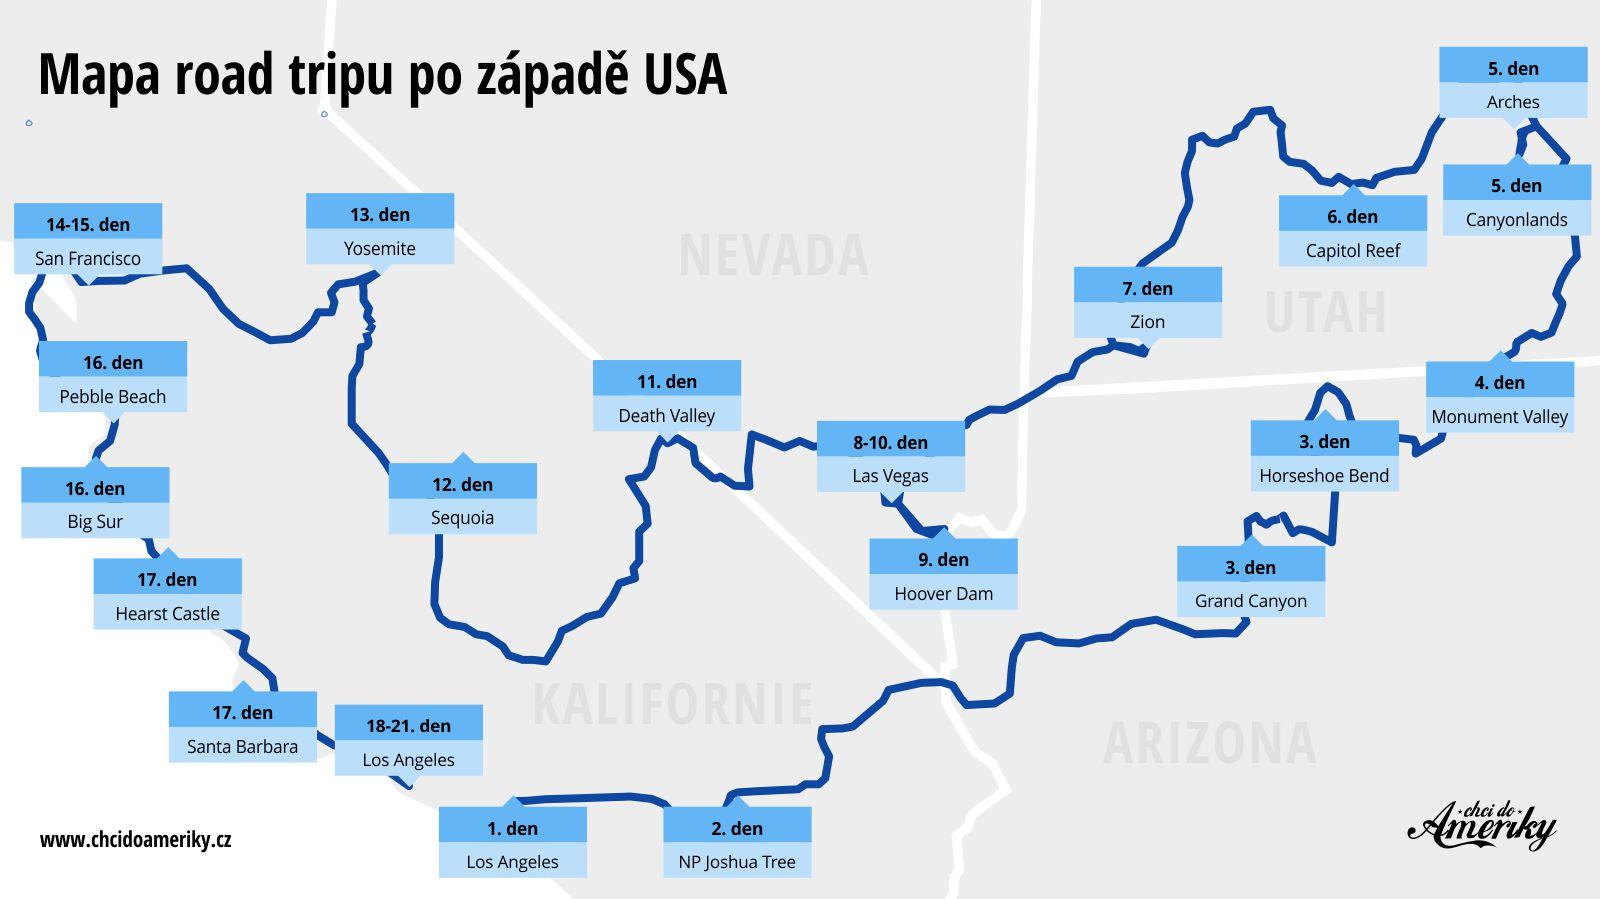 Mapa road tripu po USA